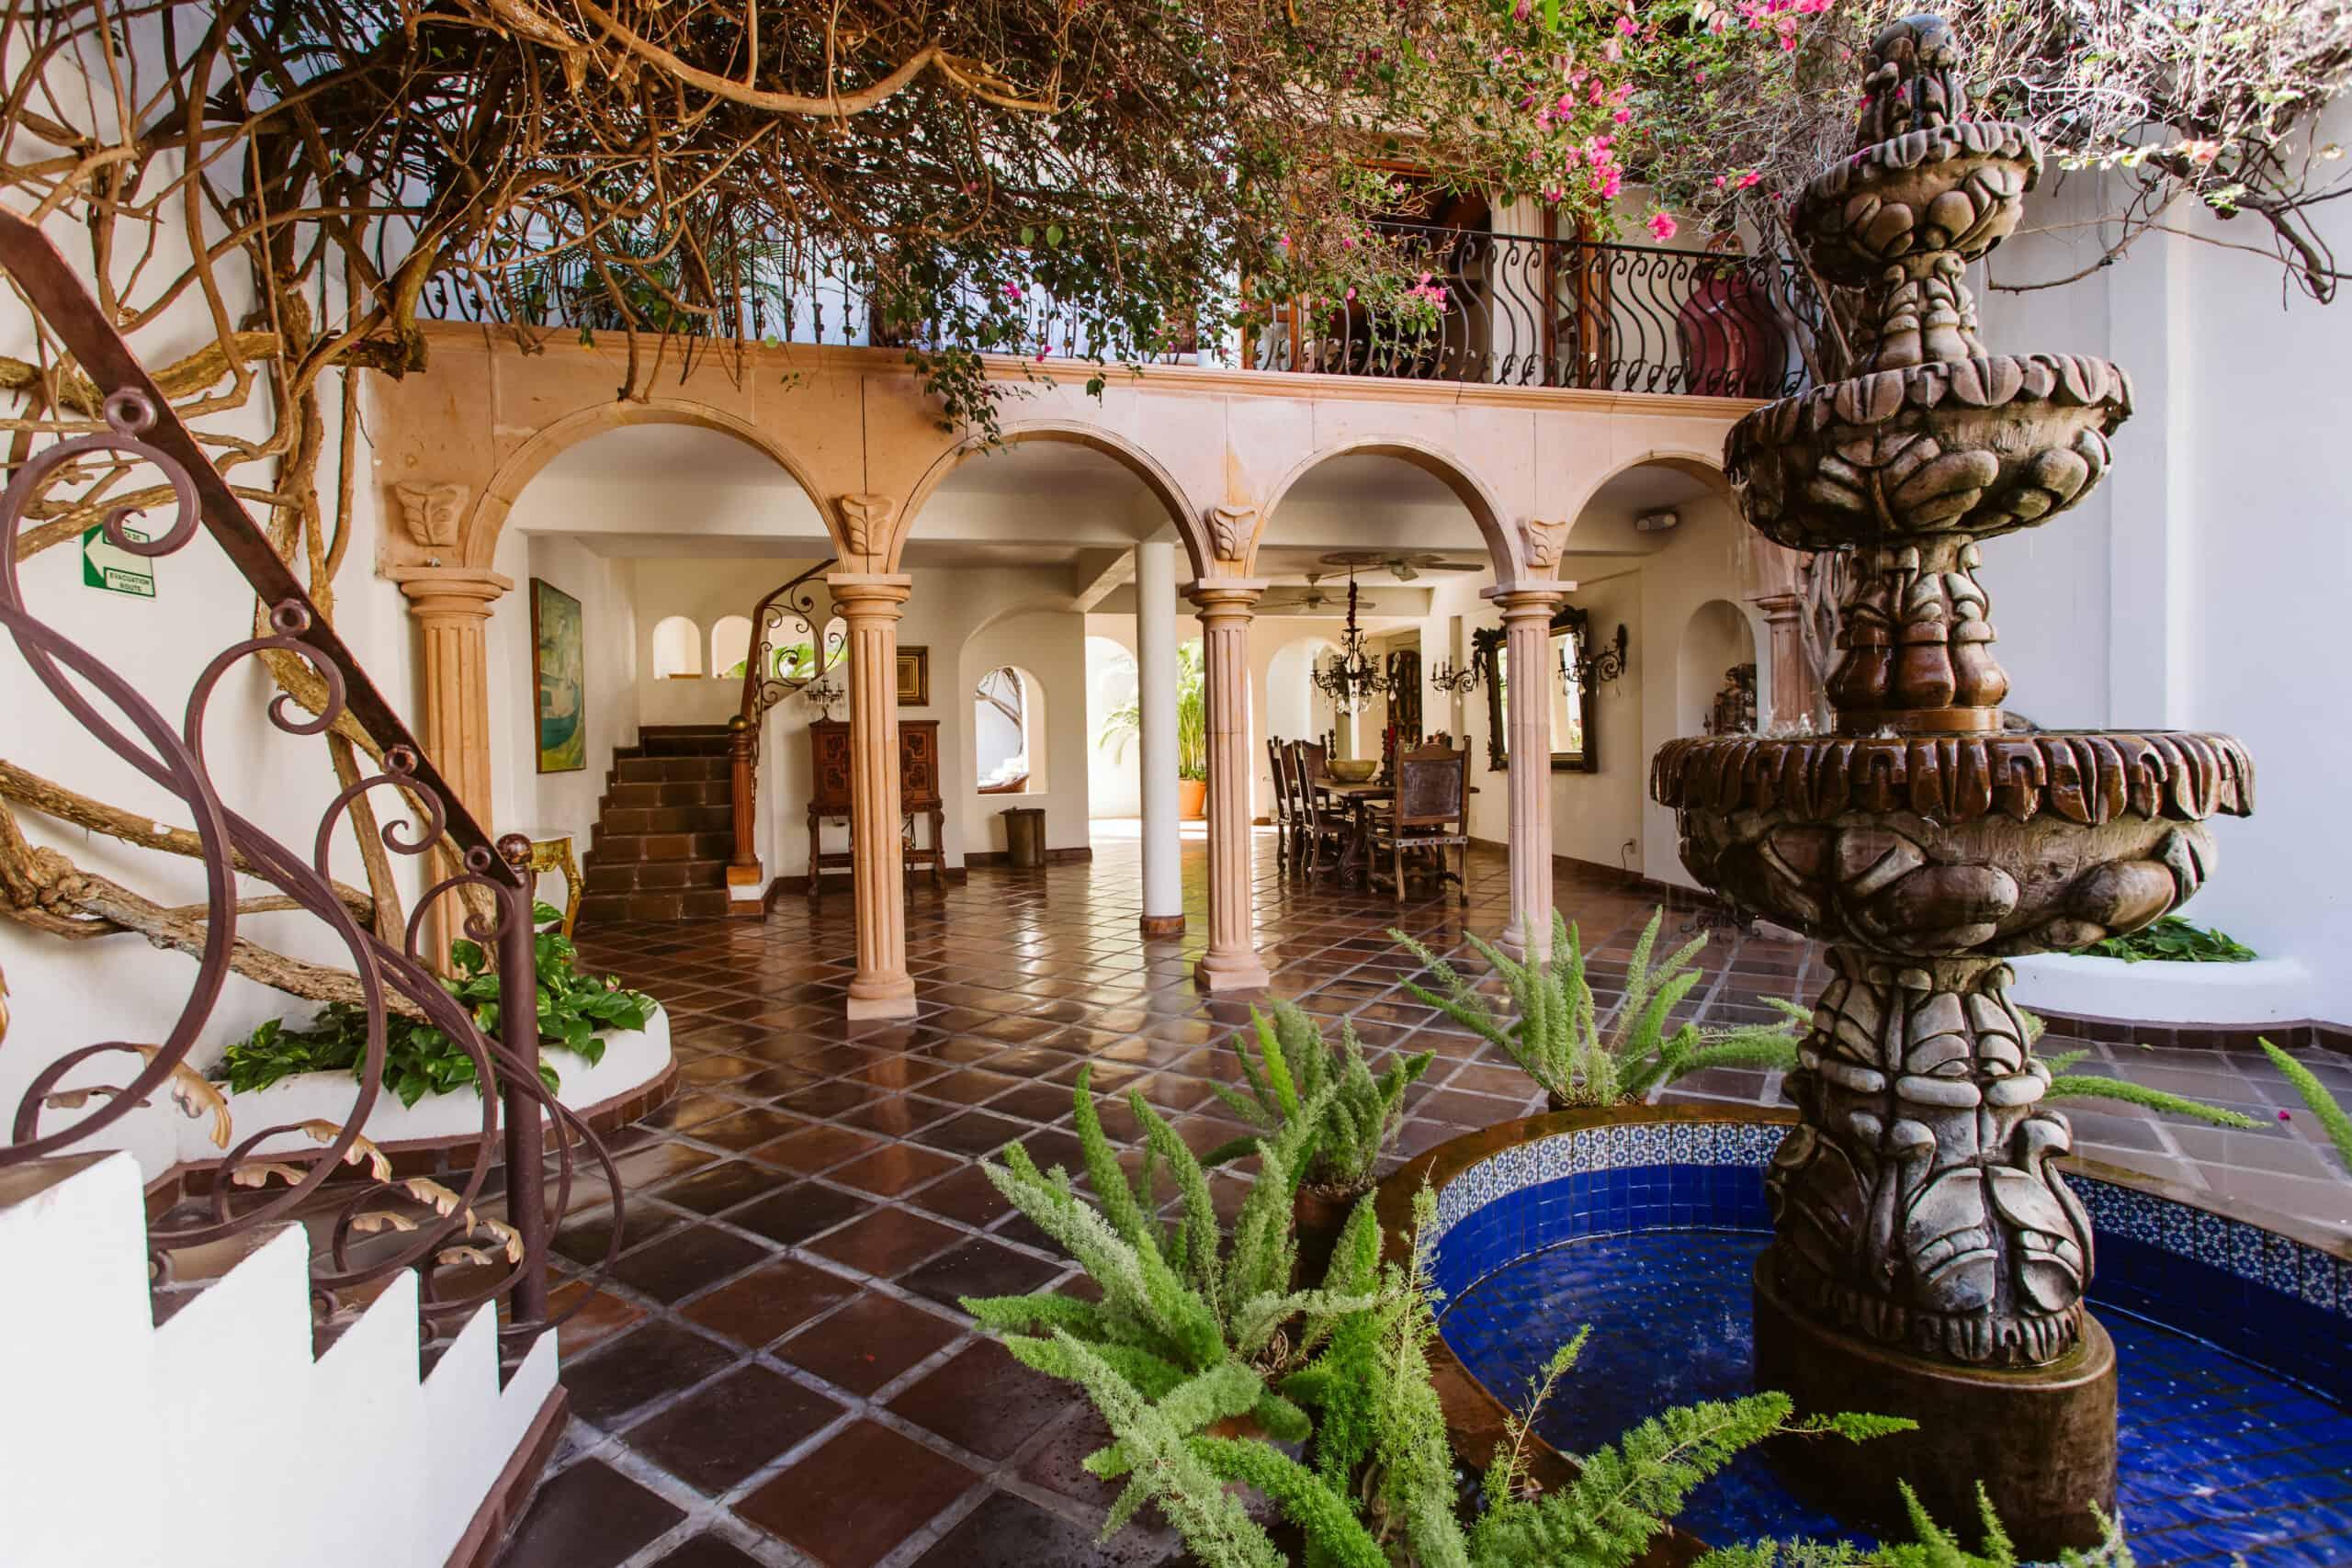 Hacienda San Angel